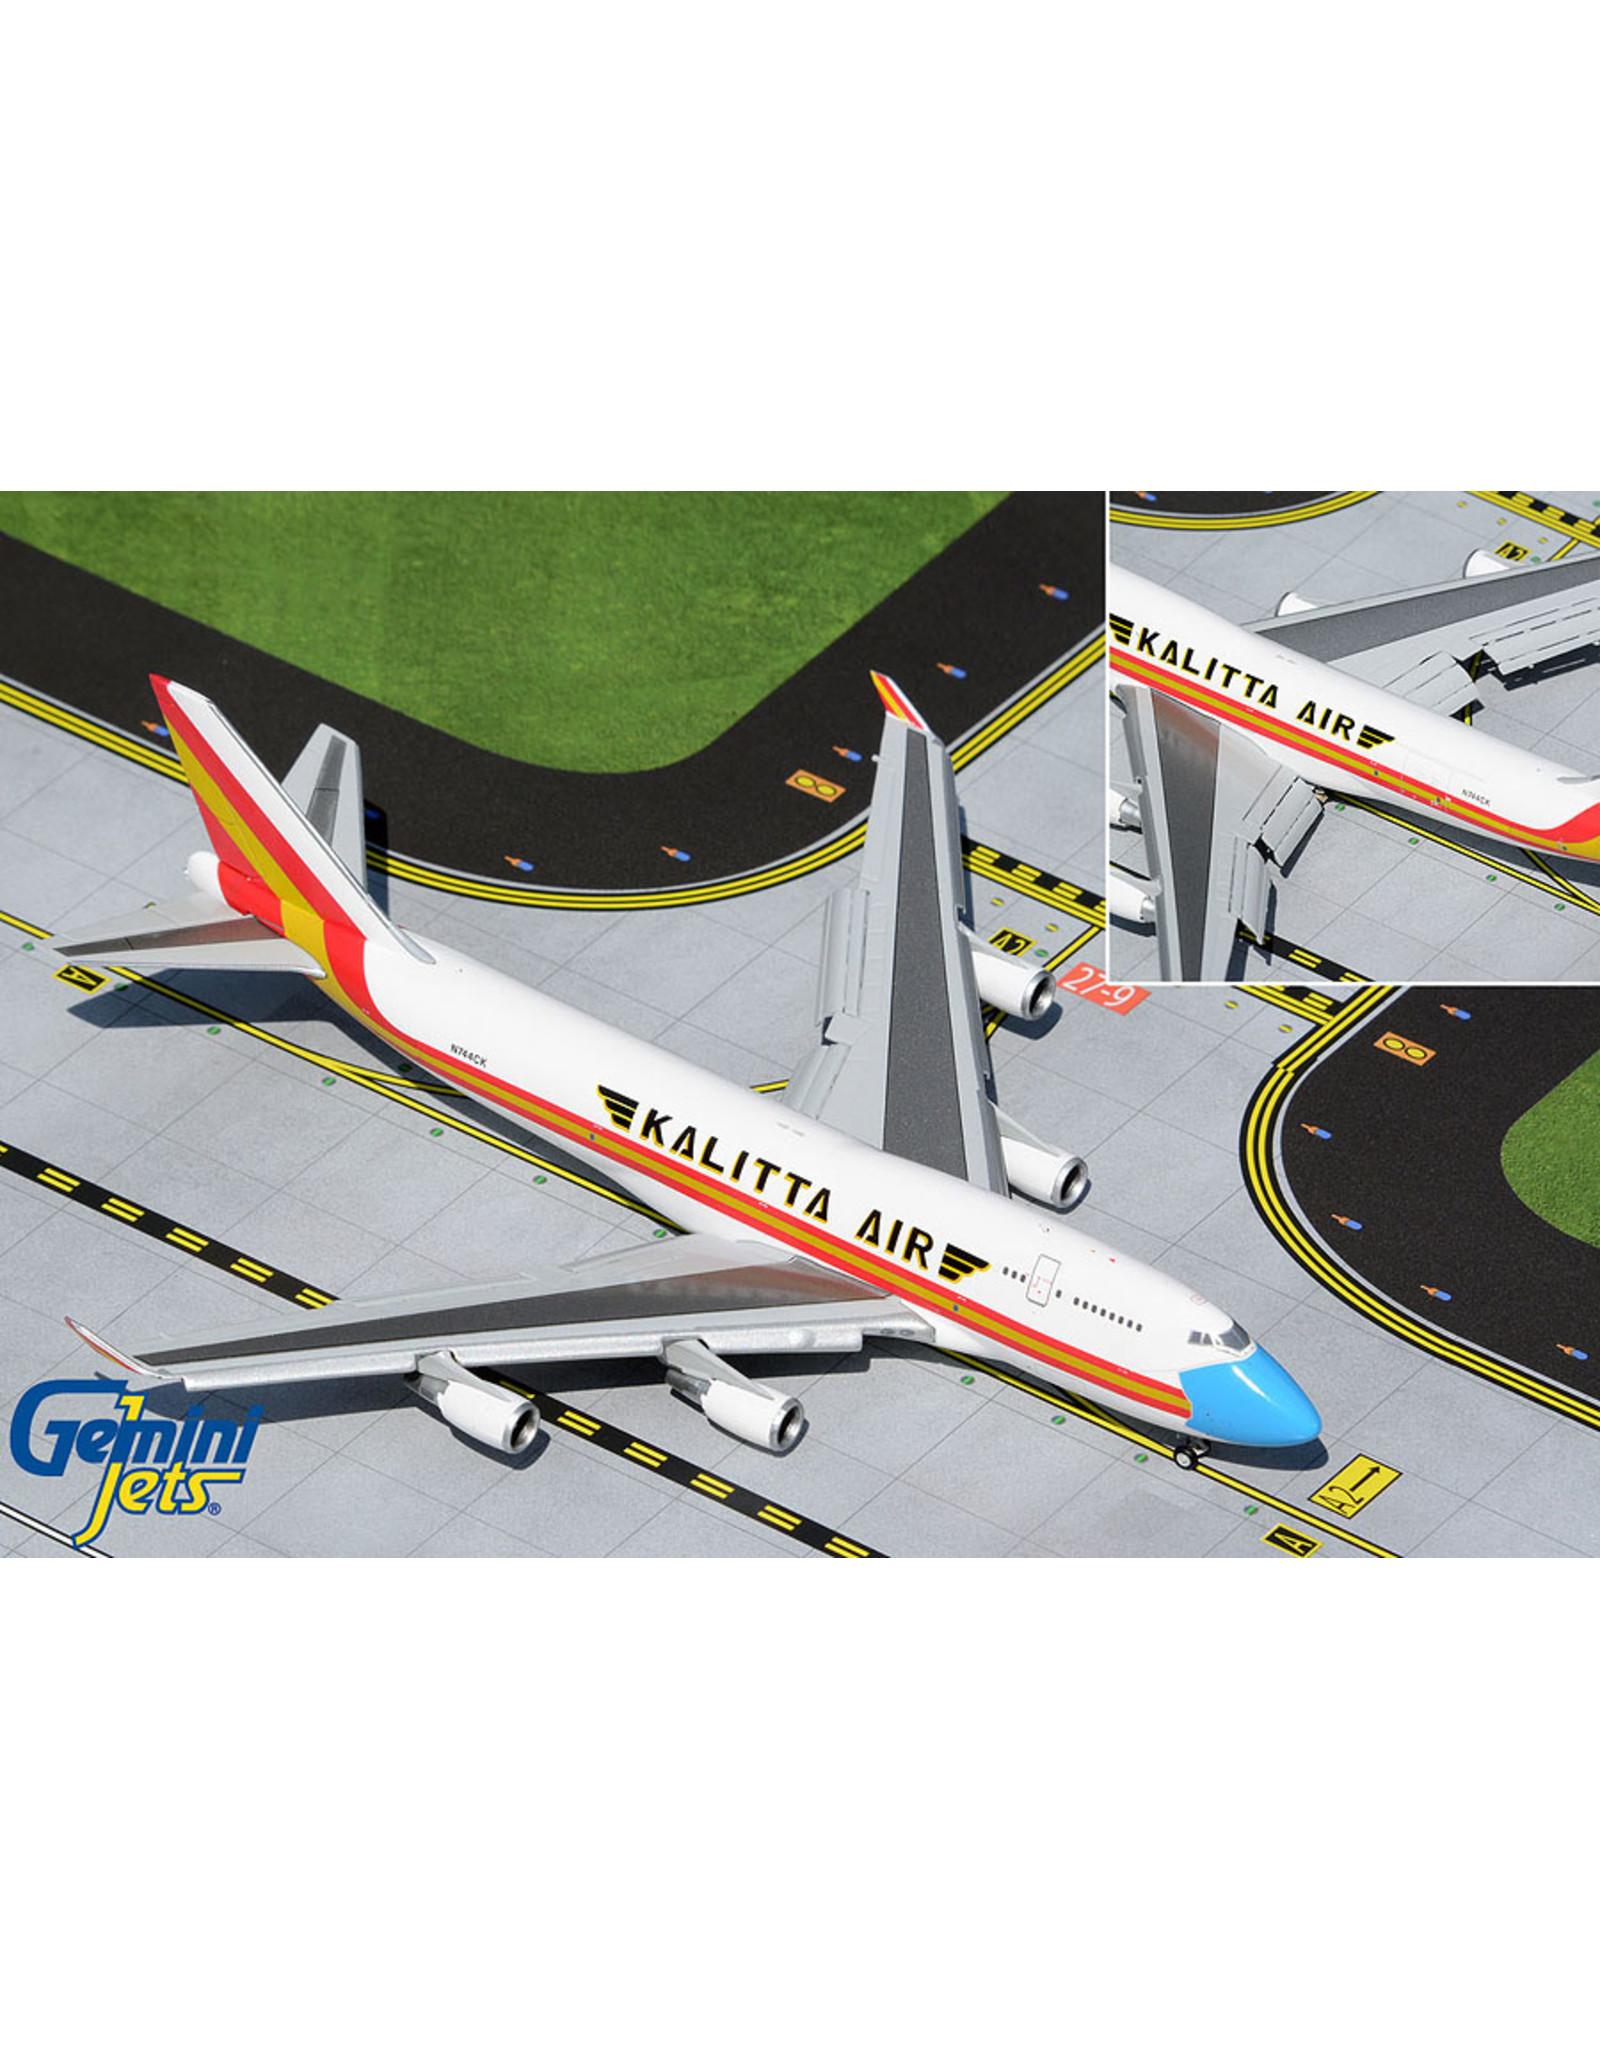 Gemini Gem4 Kalitta 747-400BCF flaps down - mask